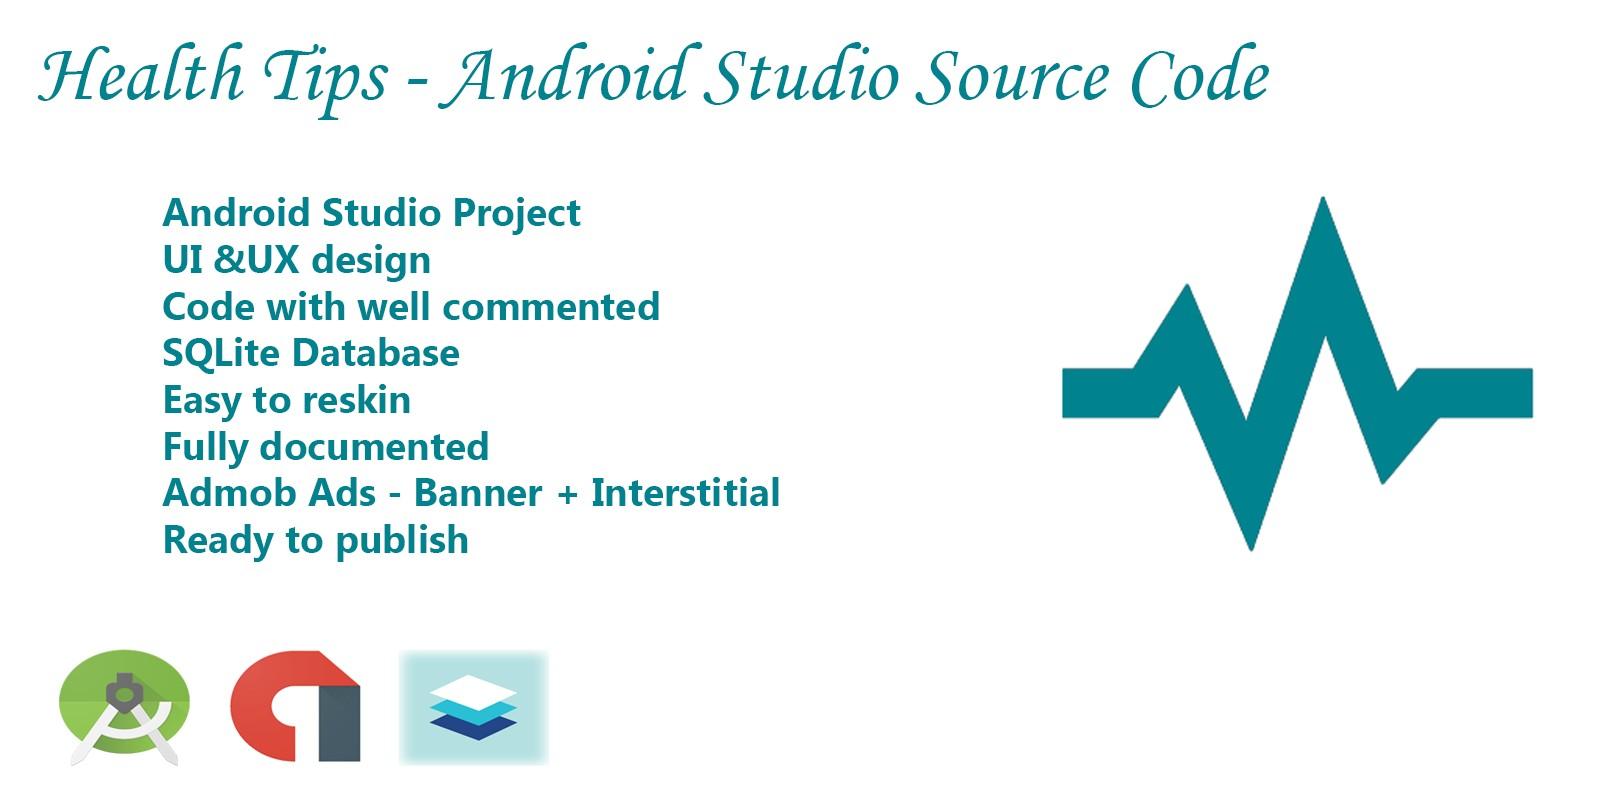 Health Tips - Android Studio Source Code